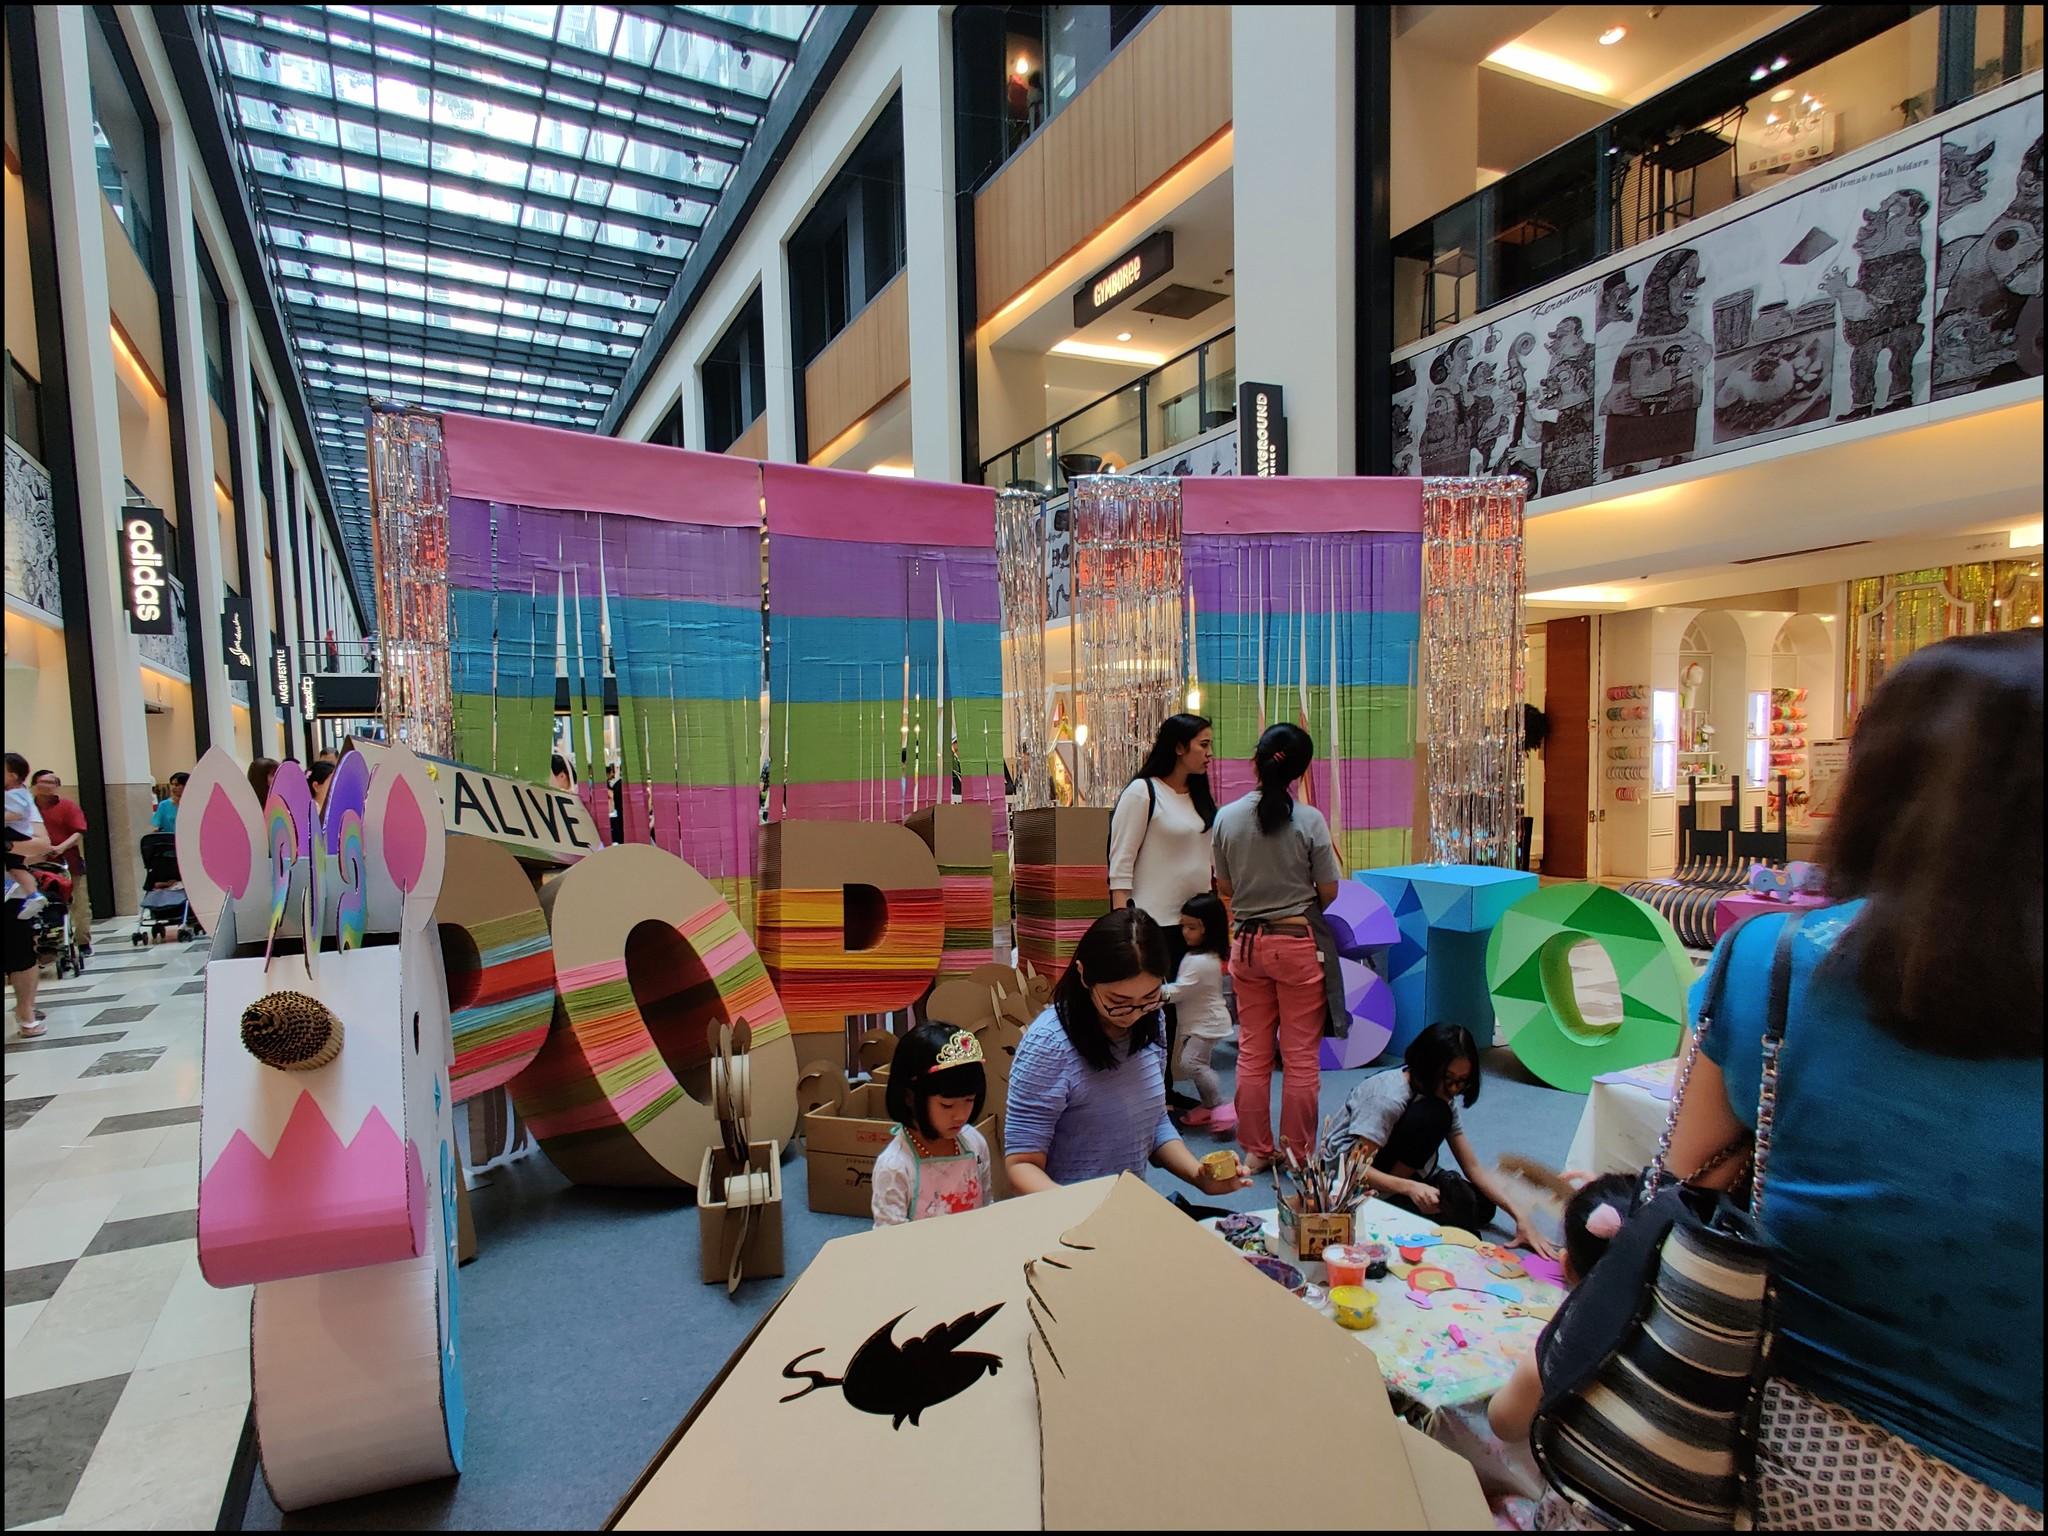 Even an area for children's activities